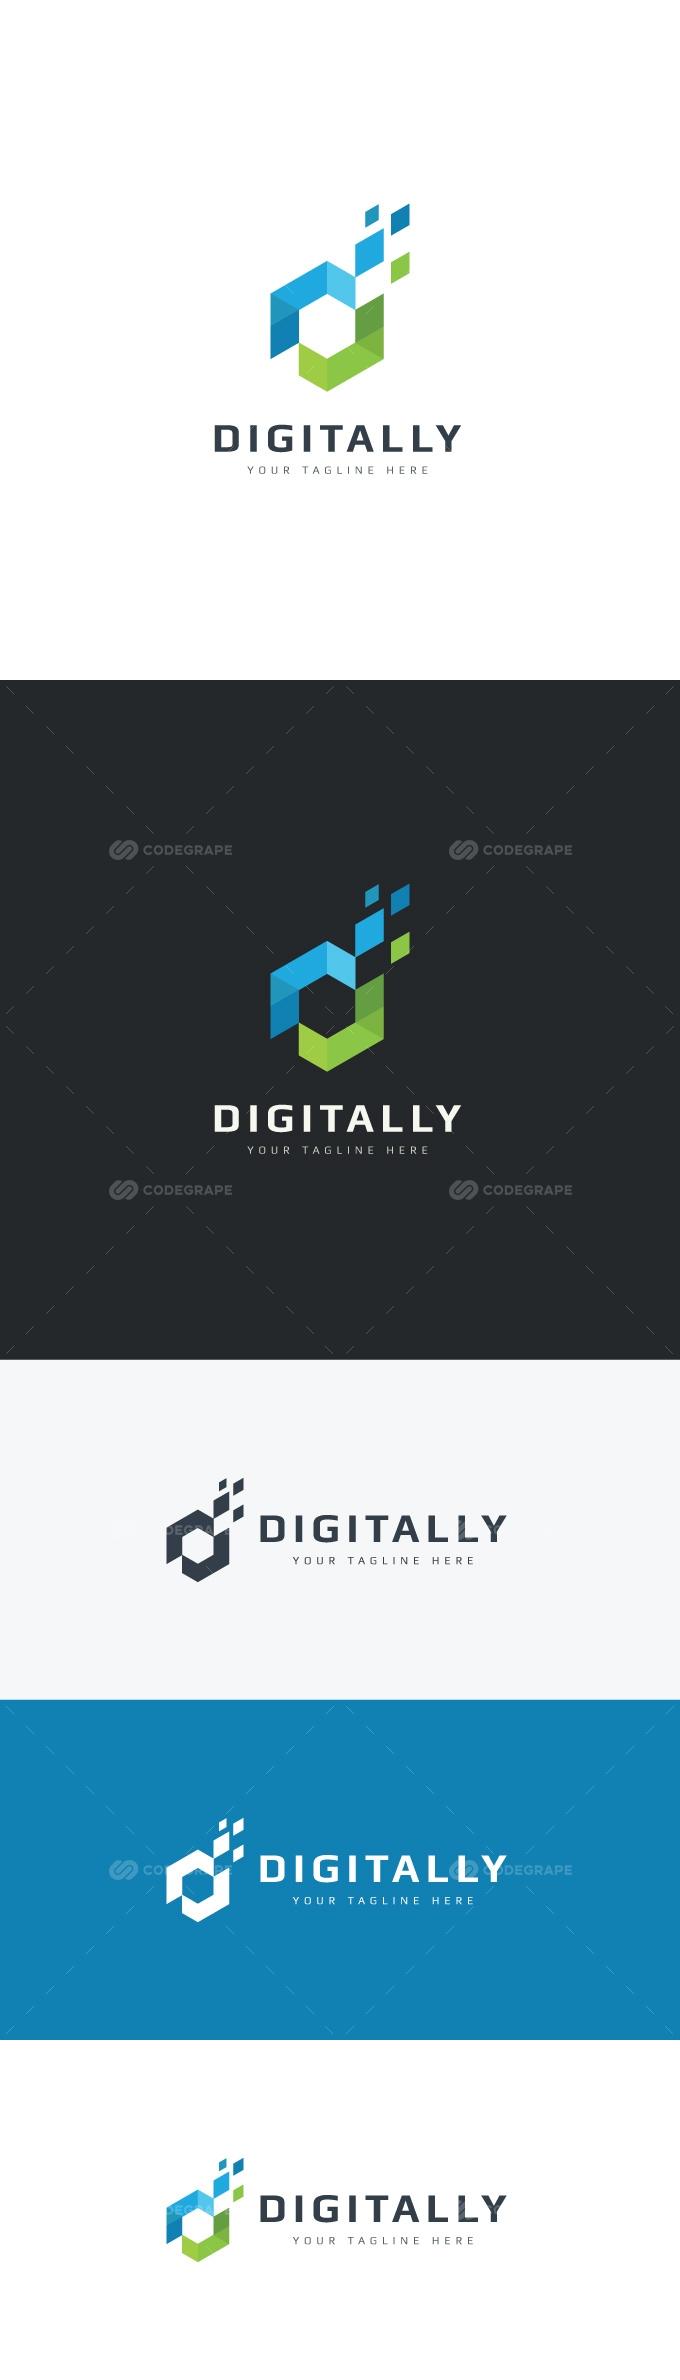 Digitally Logo